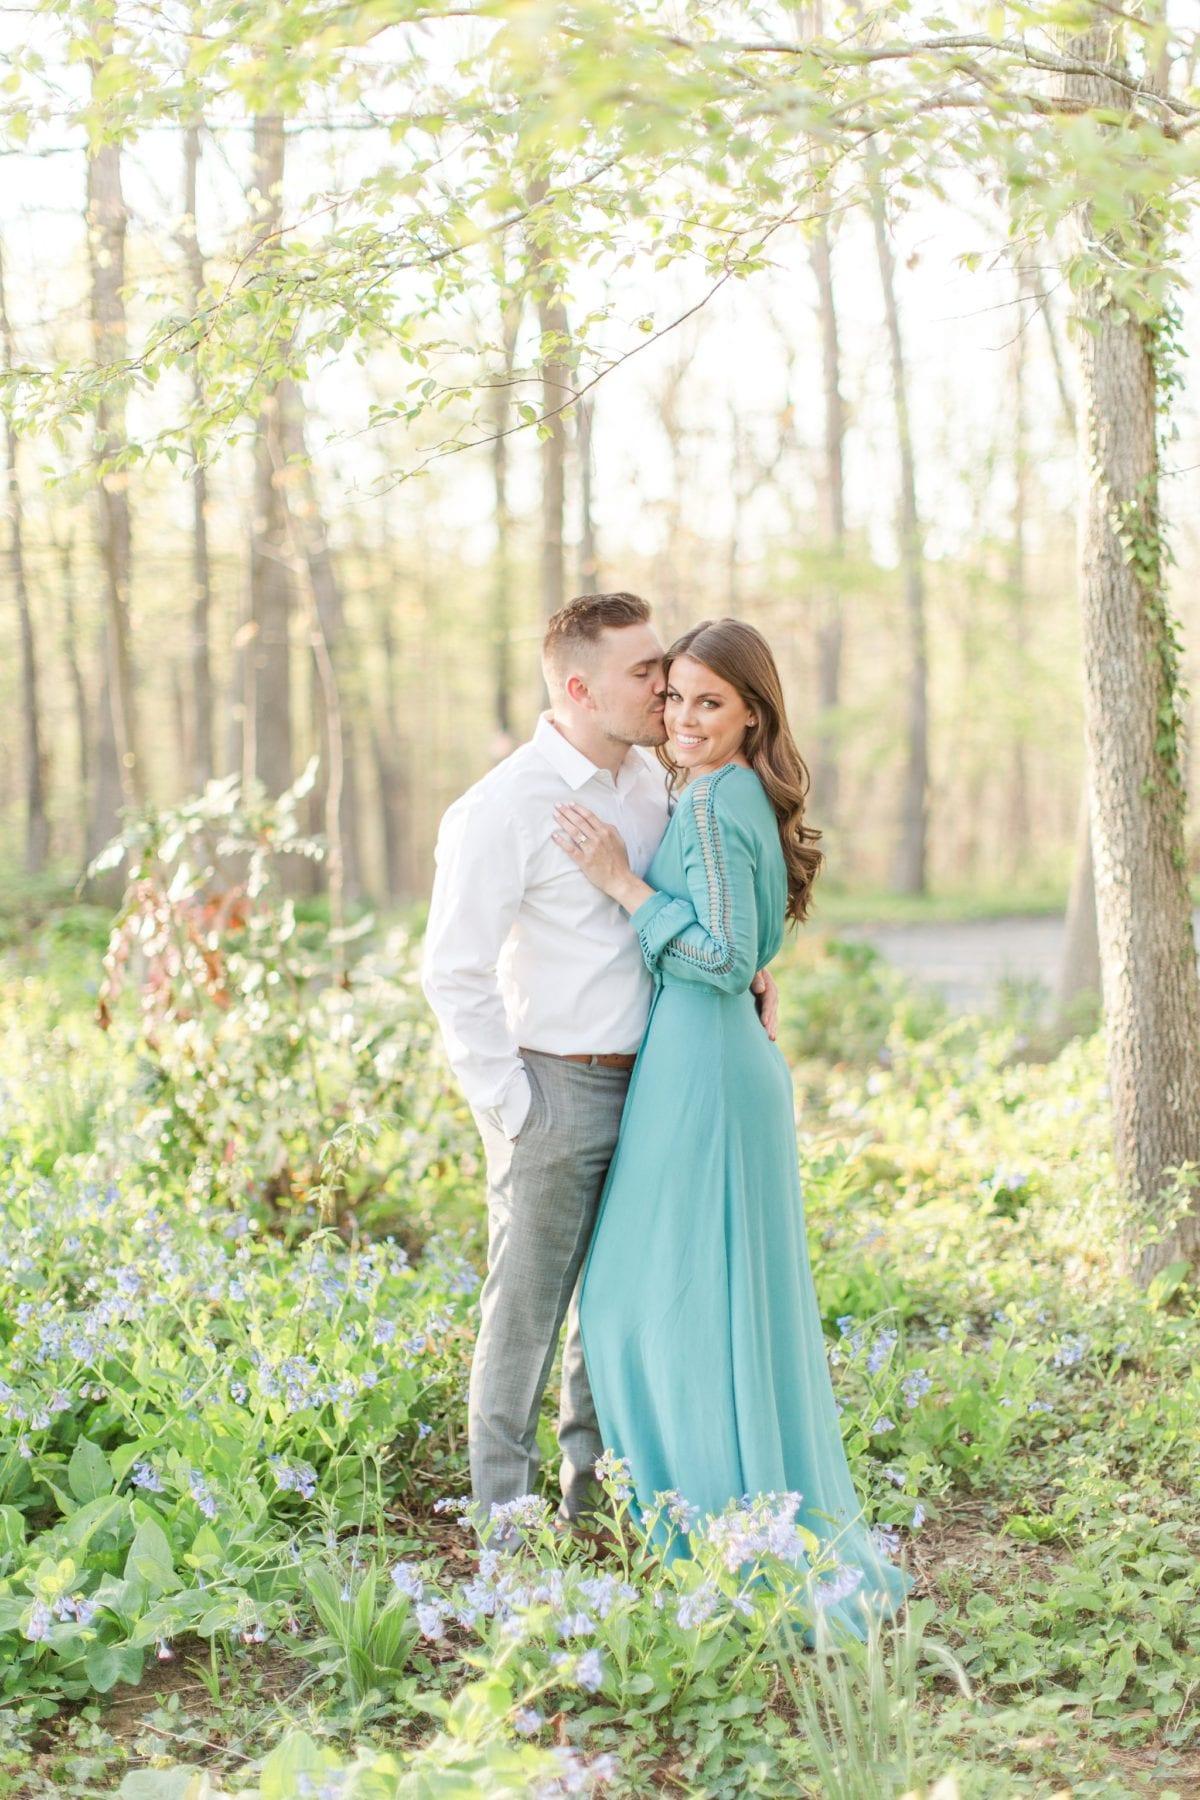 Goodstone Inn Engagement Session Virginia Wedding Photographer Megan Kelsey Photography-168.jpg